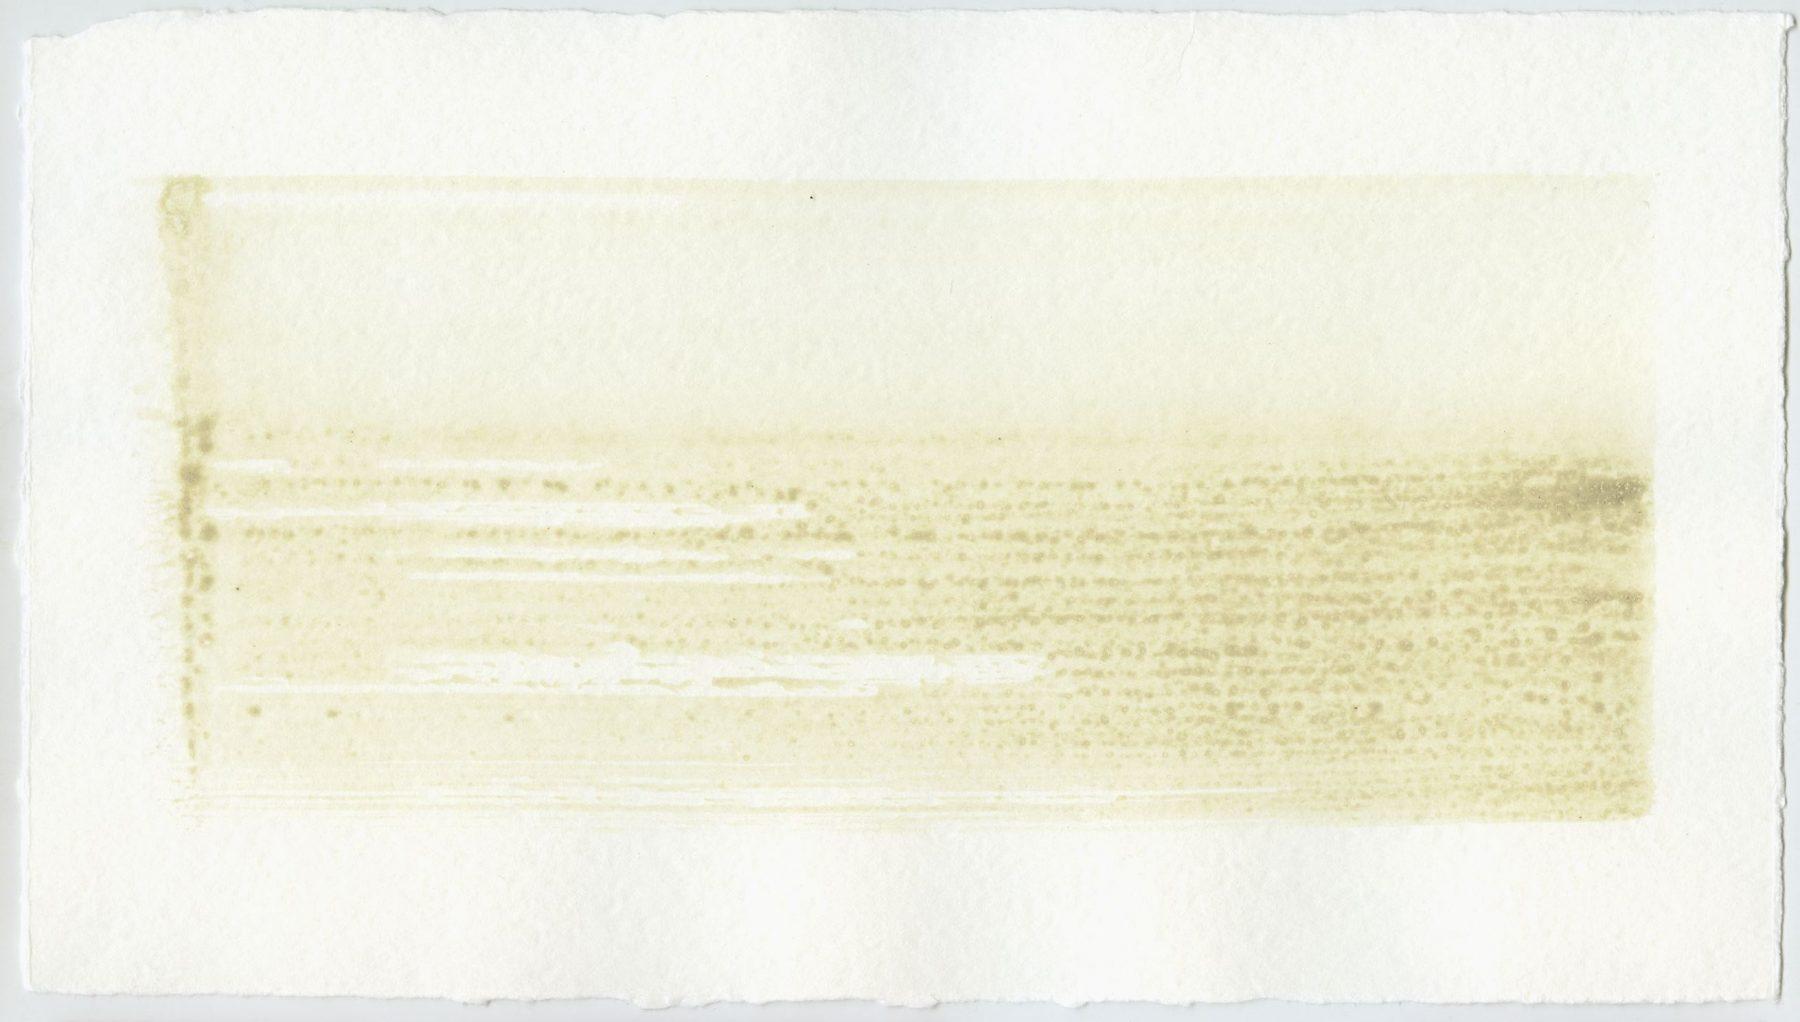 Brush stroke no. 85 - Selfmade pigment: Slabroek grijs